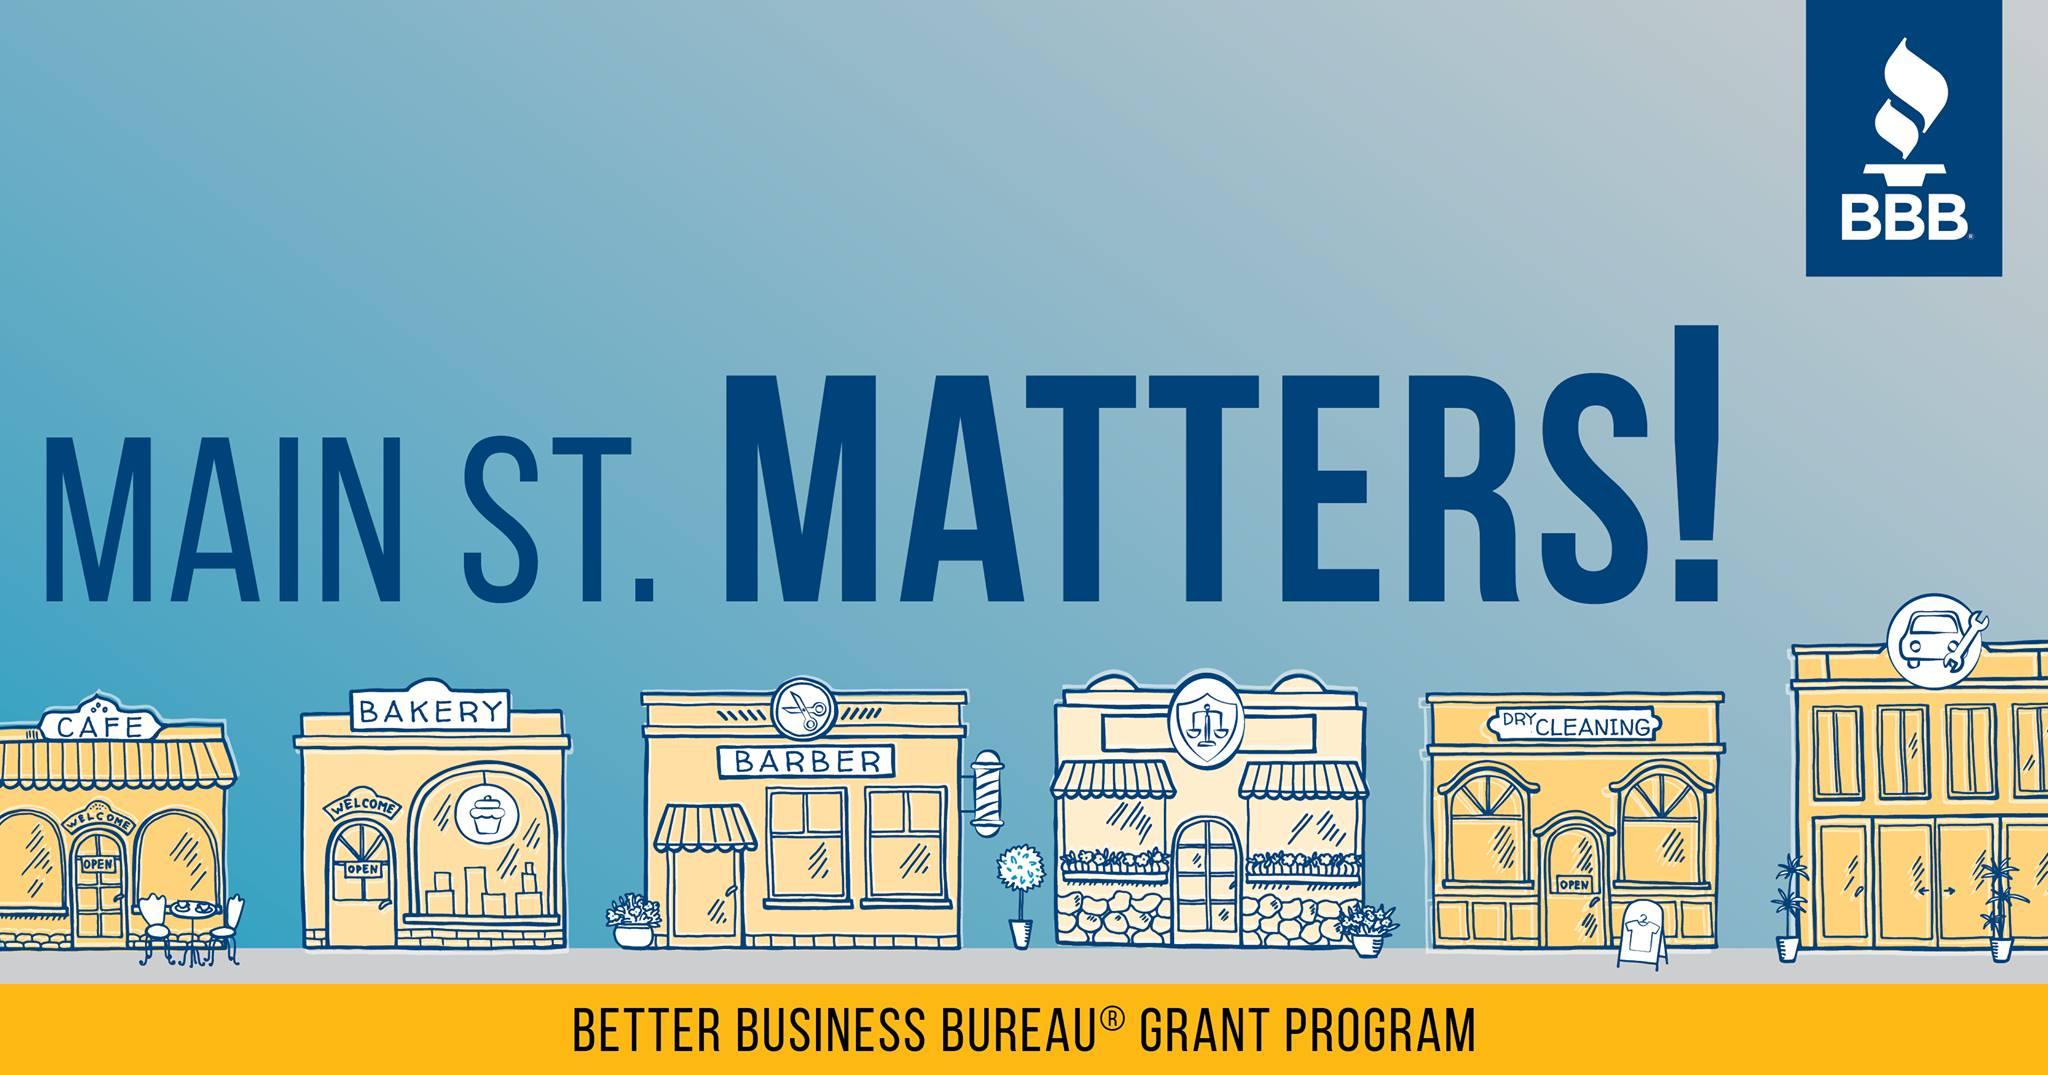 BBB Awards Main St. Matters Grant To Havasu Recipients